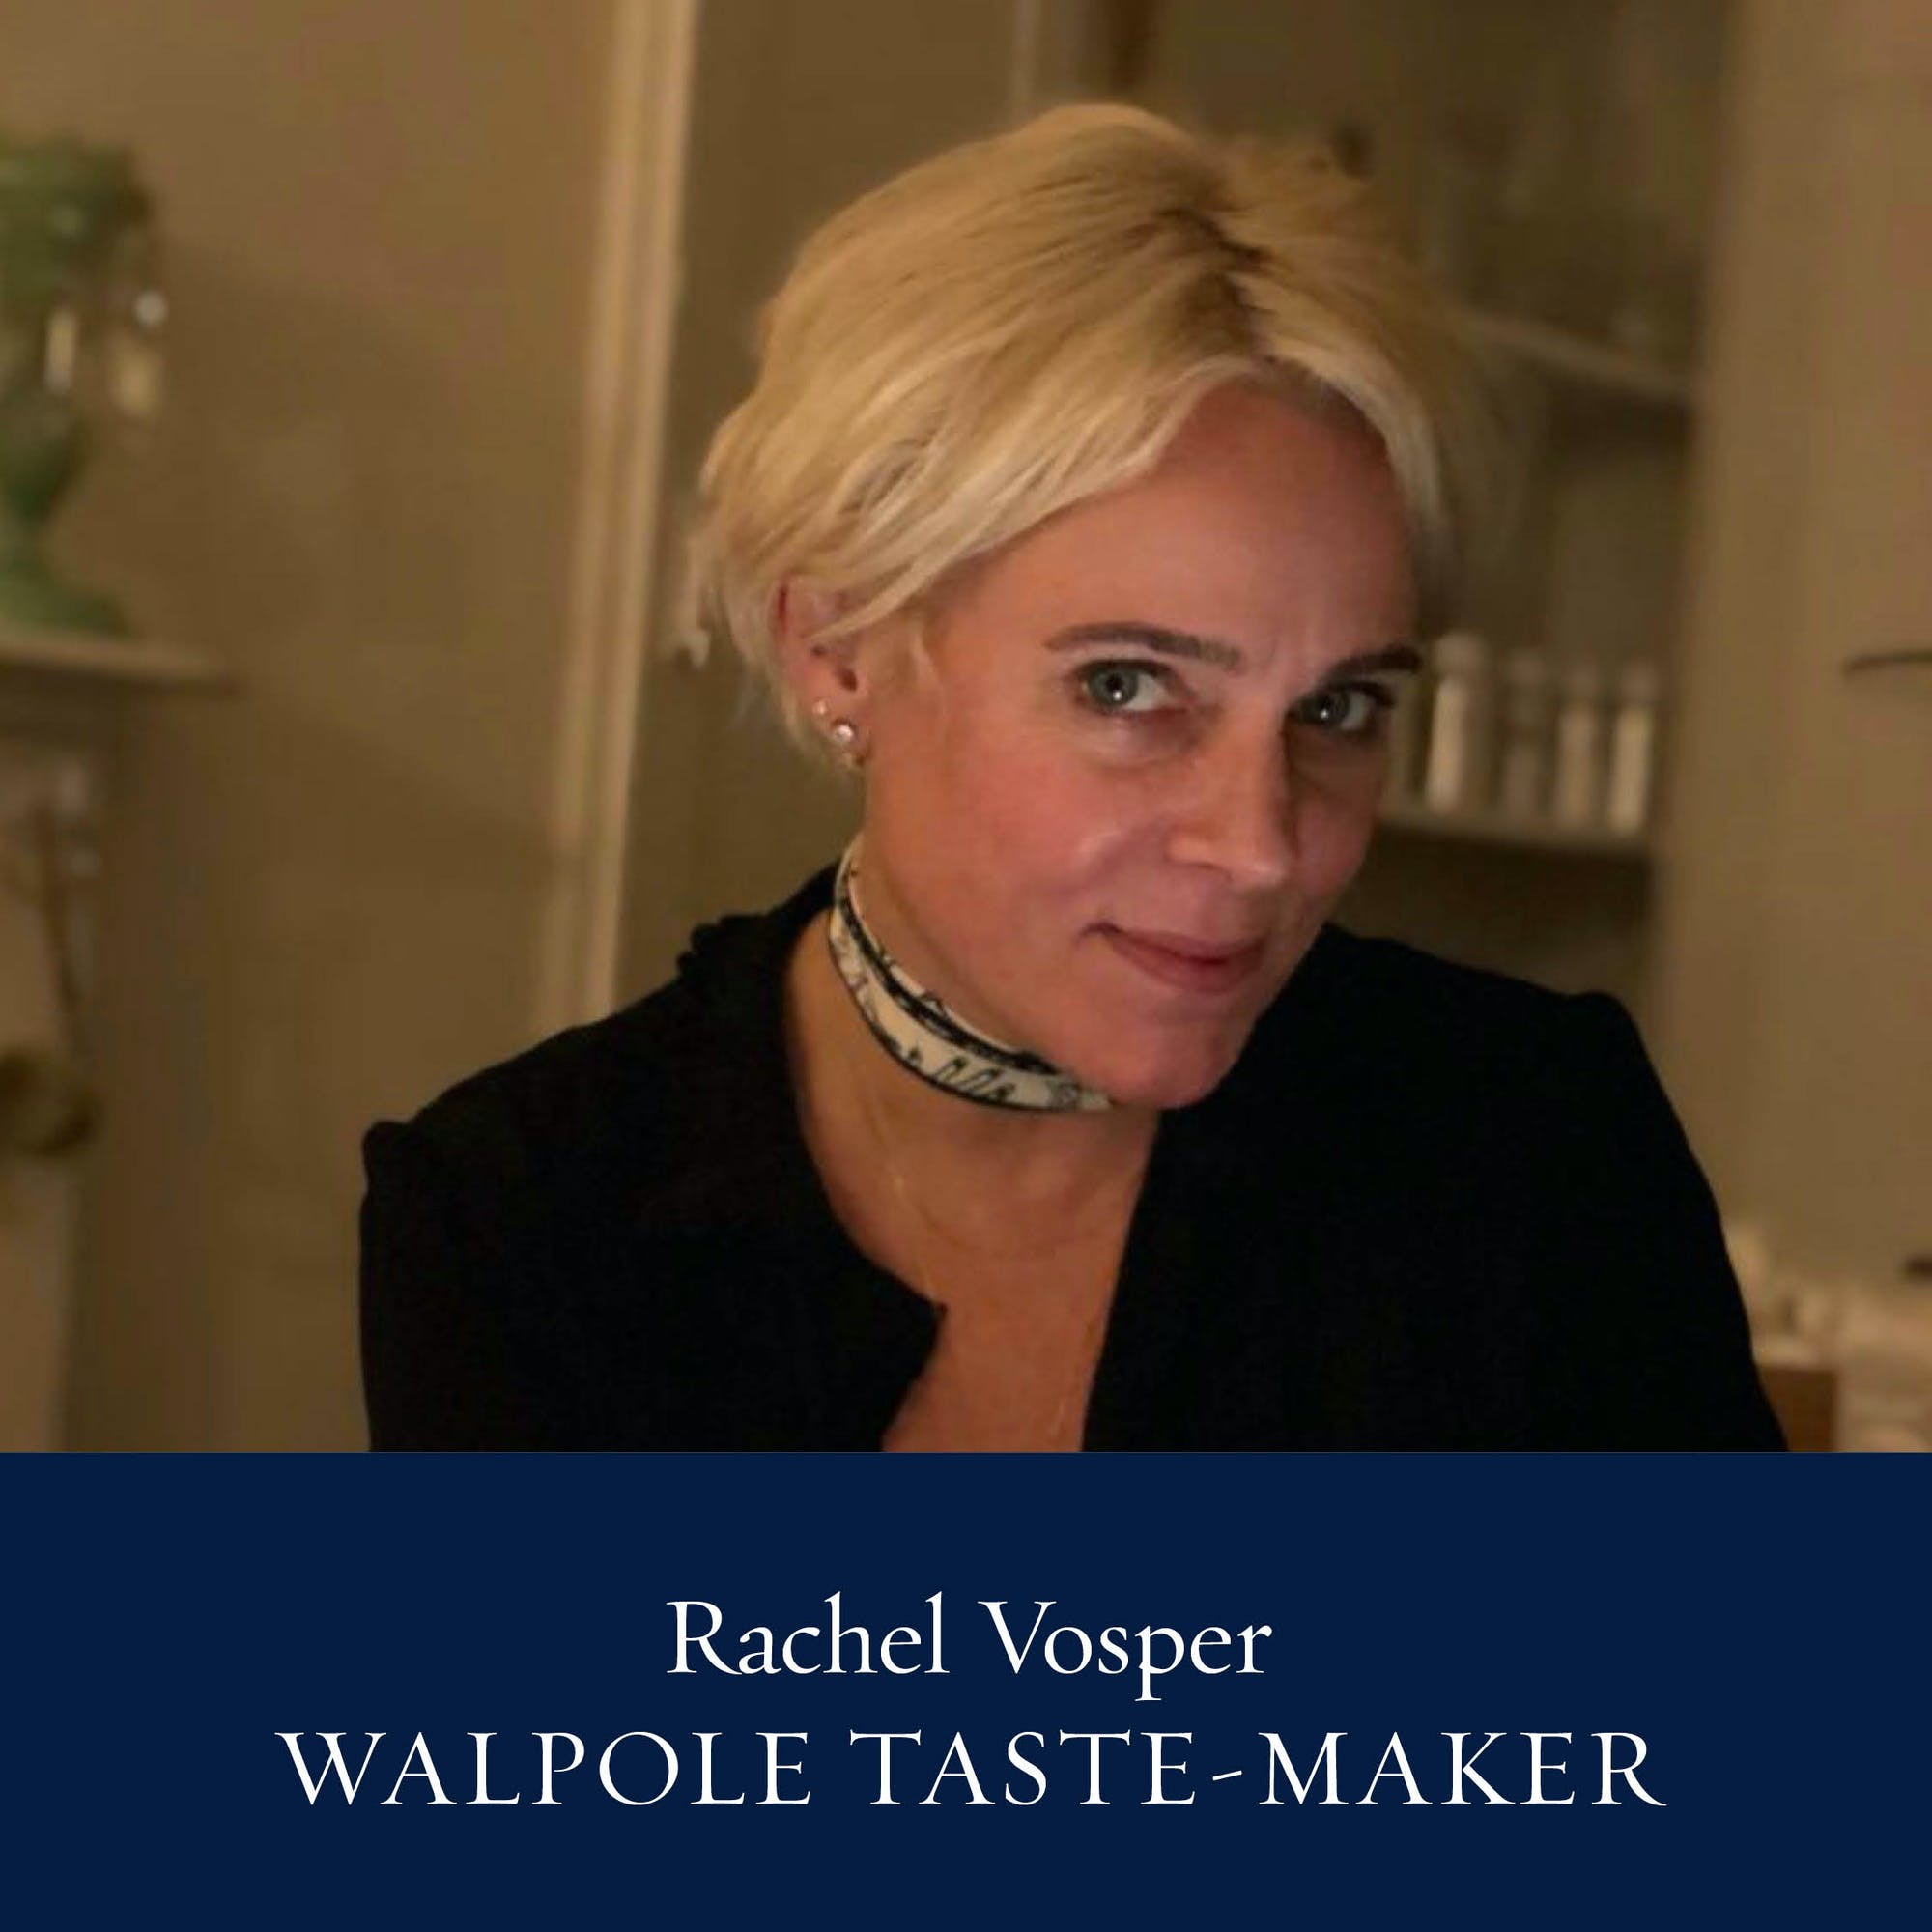 The Walpole Power List 2020  The Taste-Makers: Rachel Vosper